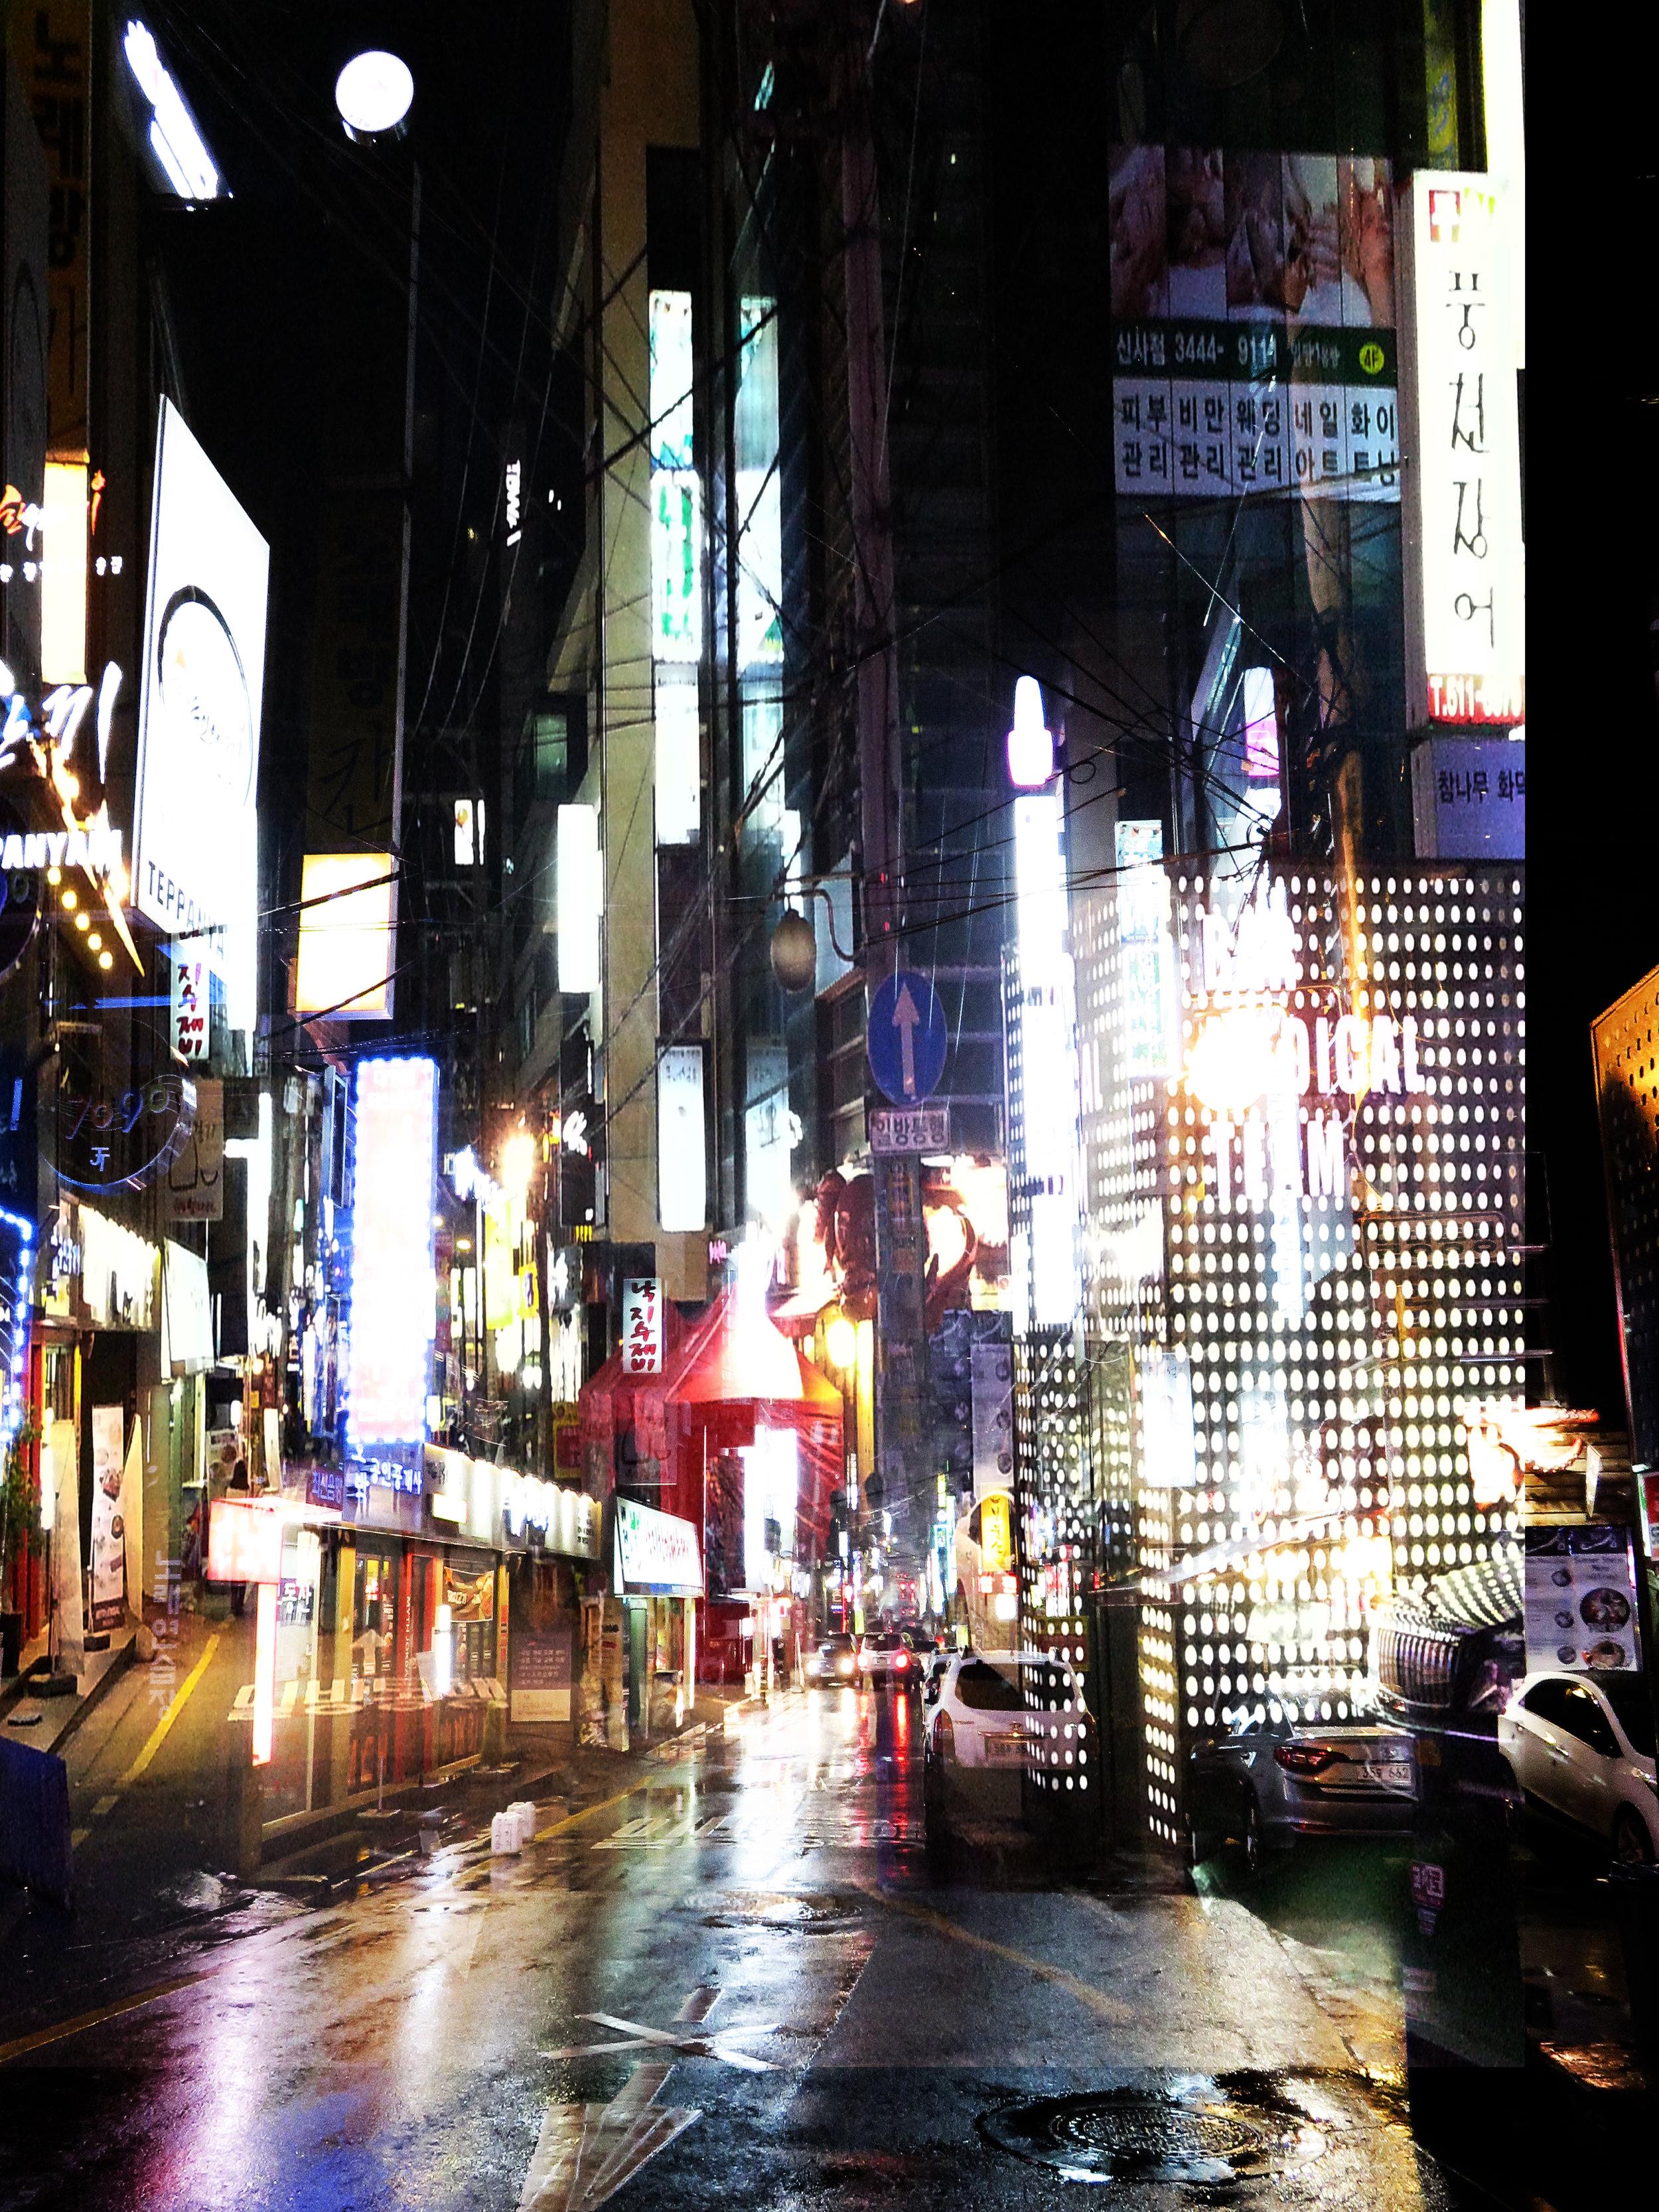 Rainy night in Shinsa-dong,Gangnam - Seoul Korea